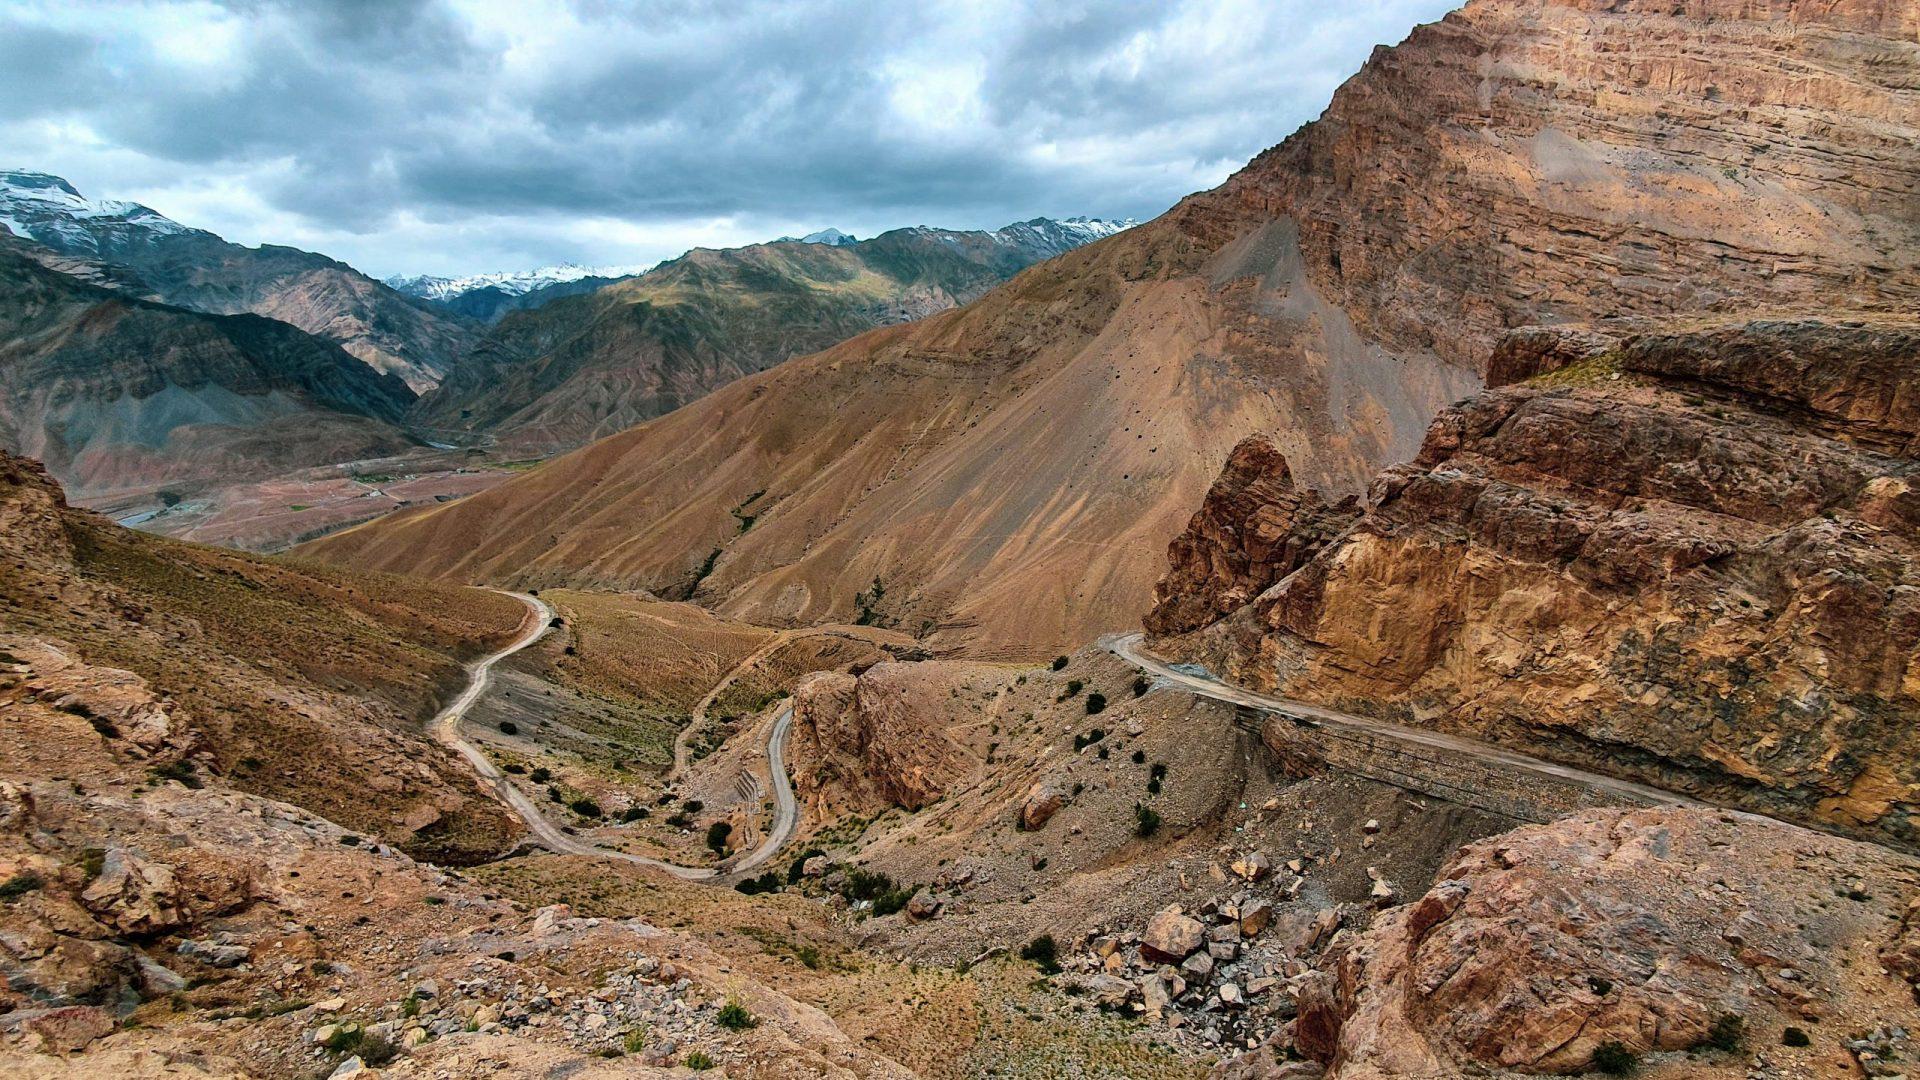 Spiral Road in Spiti Valley